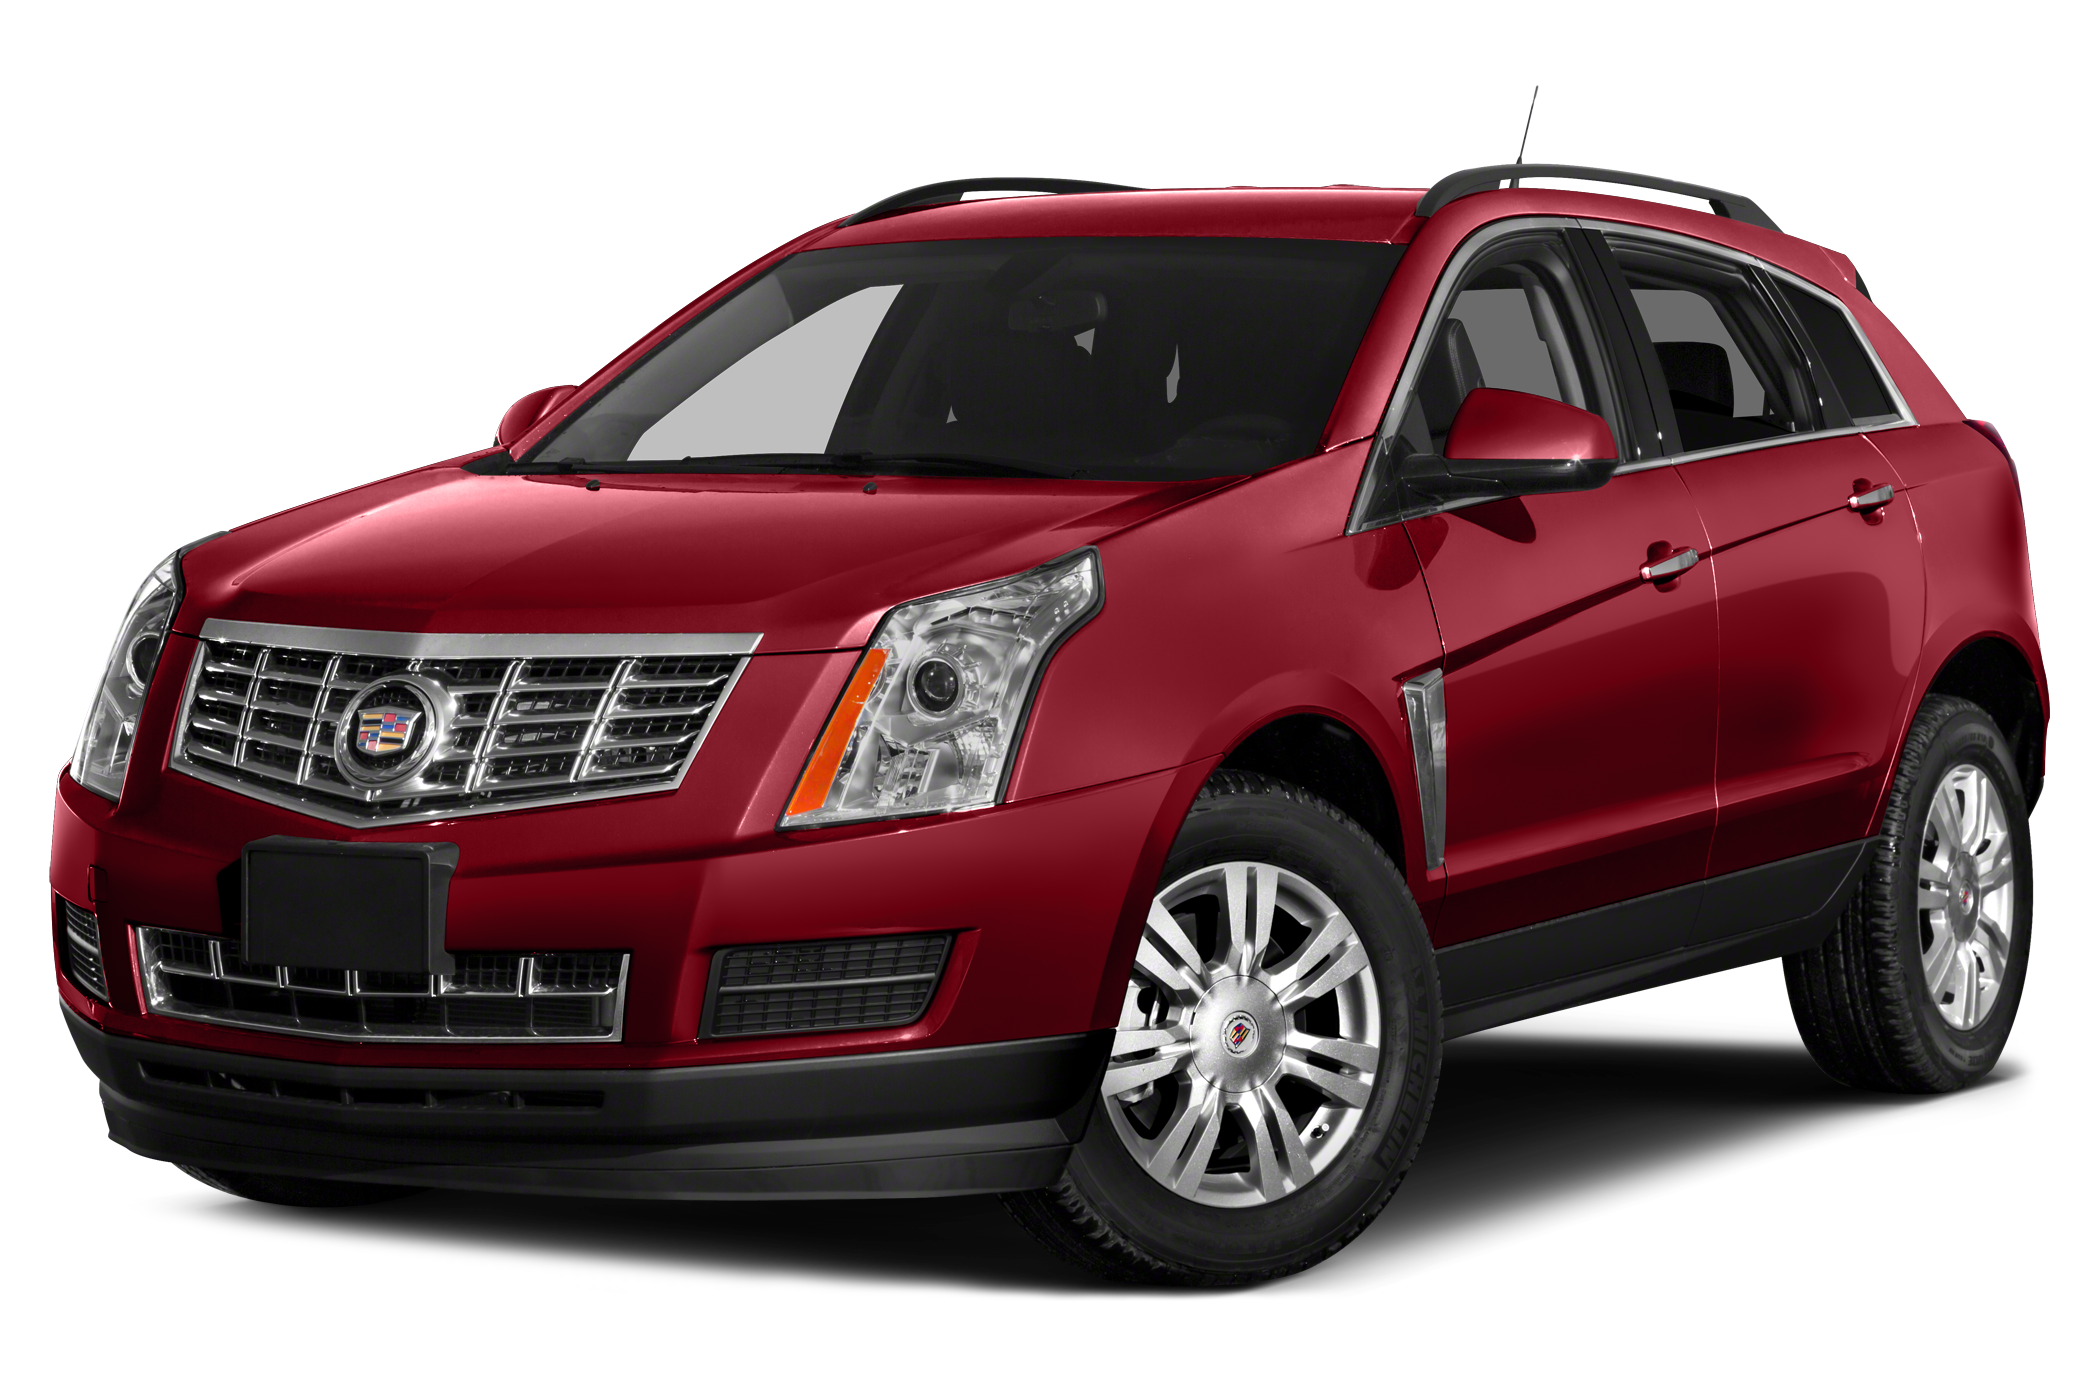 Acura Rdx Lease Deals >> My Car Comparison - CarsDirect.com